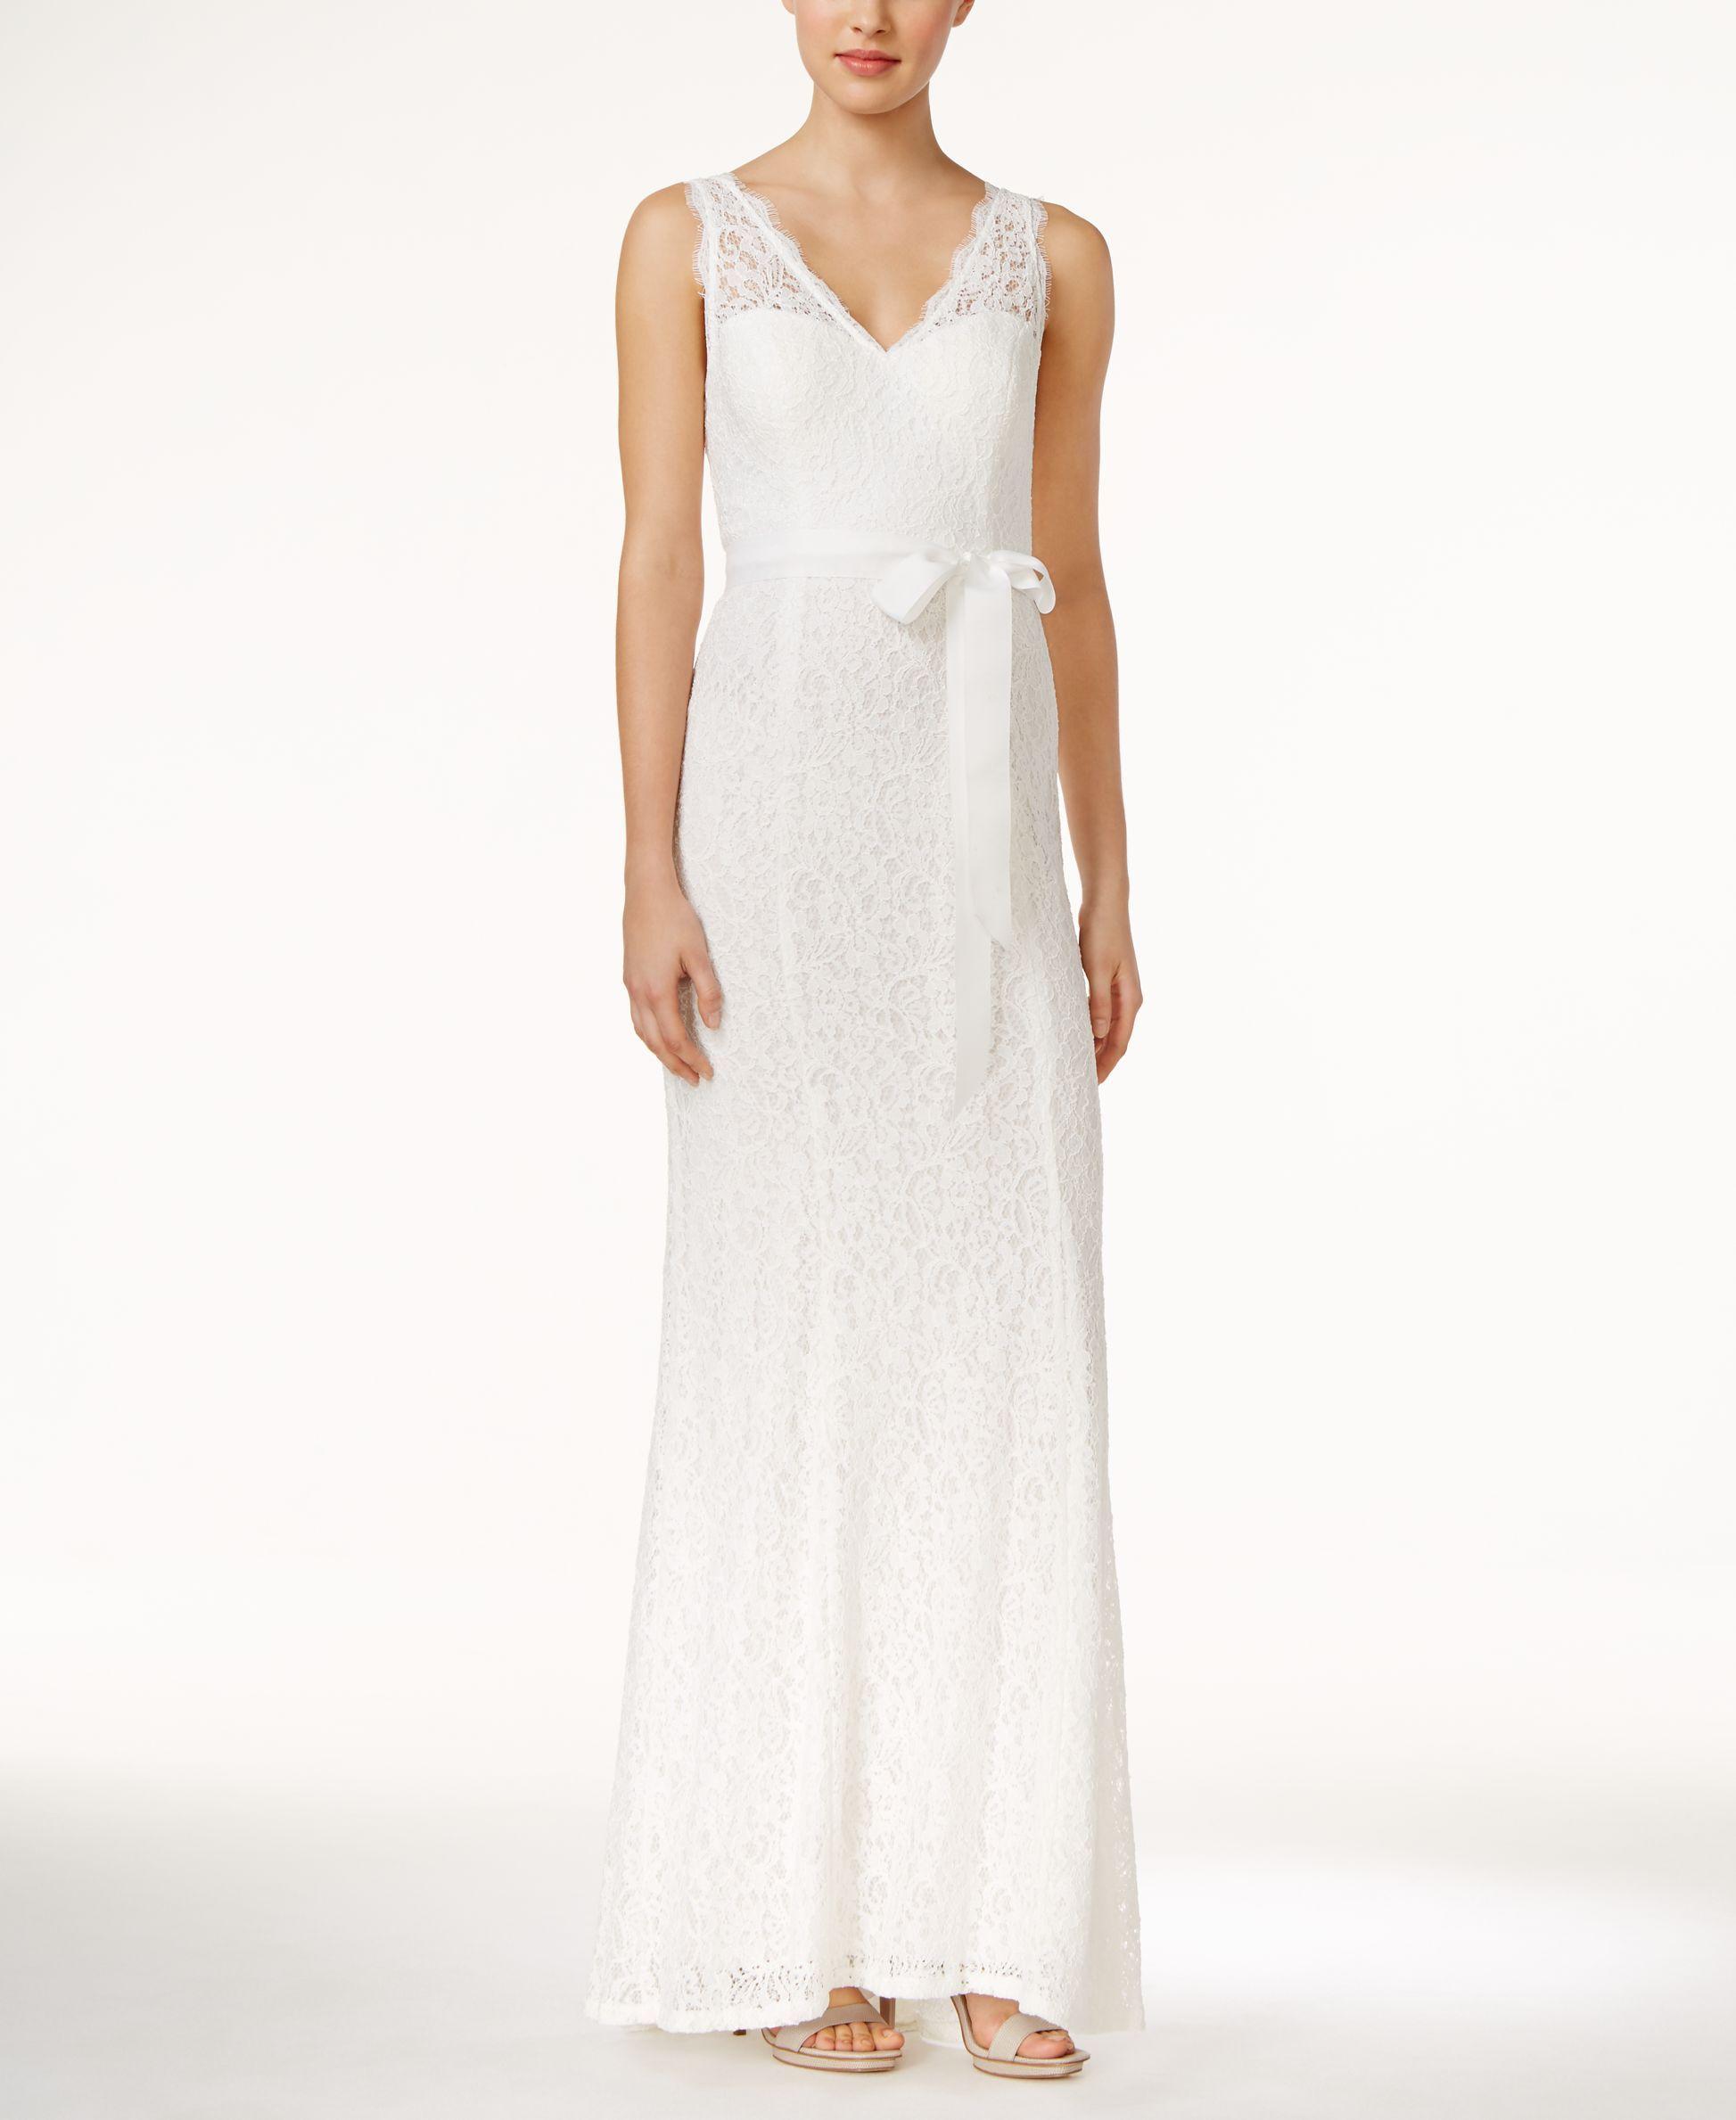 Macy S Wedding Day Dresses: Wedding Day Dresses, Latest Bridal